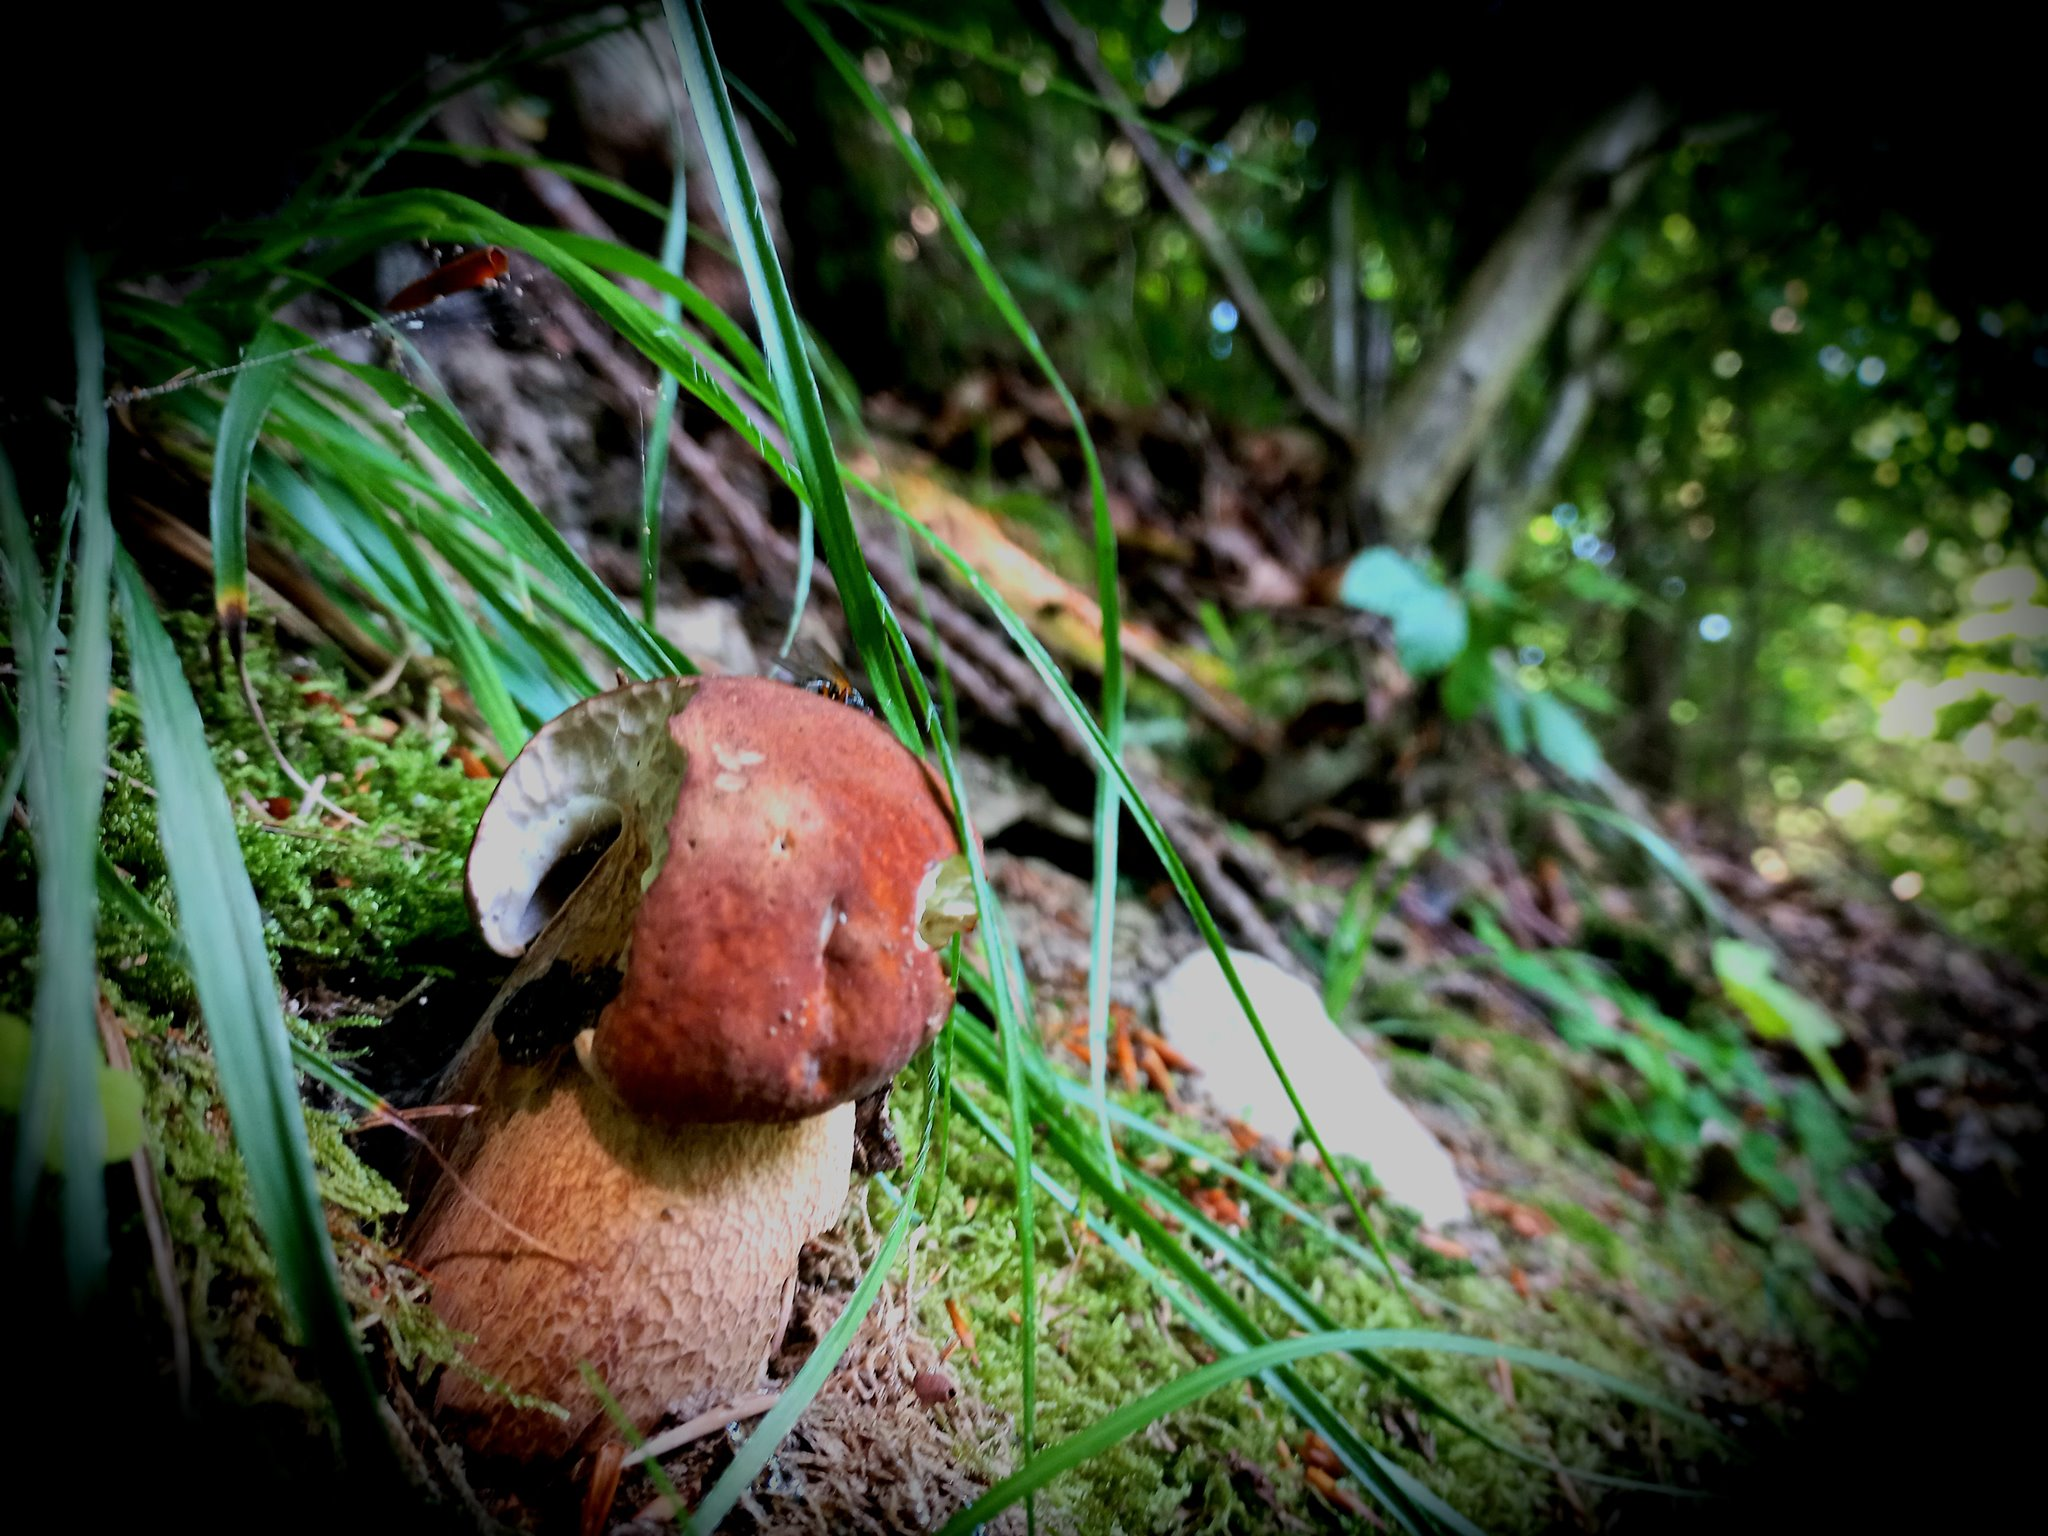 ciuperci maramures 2021)